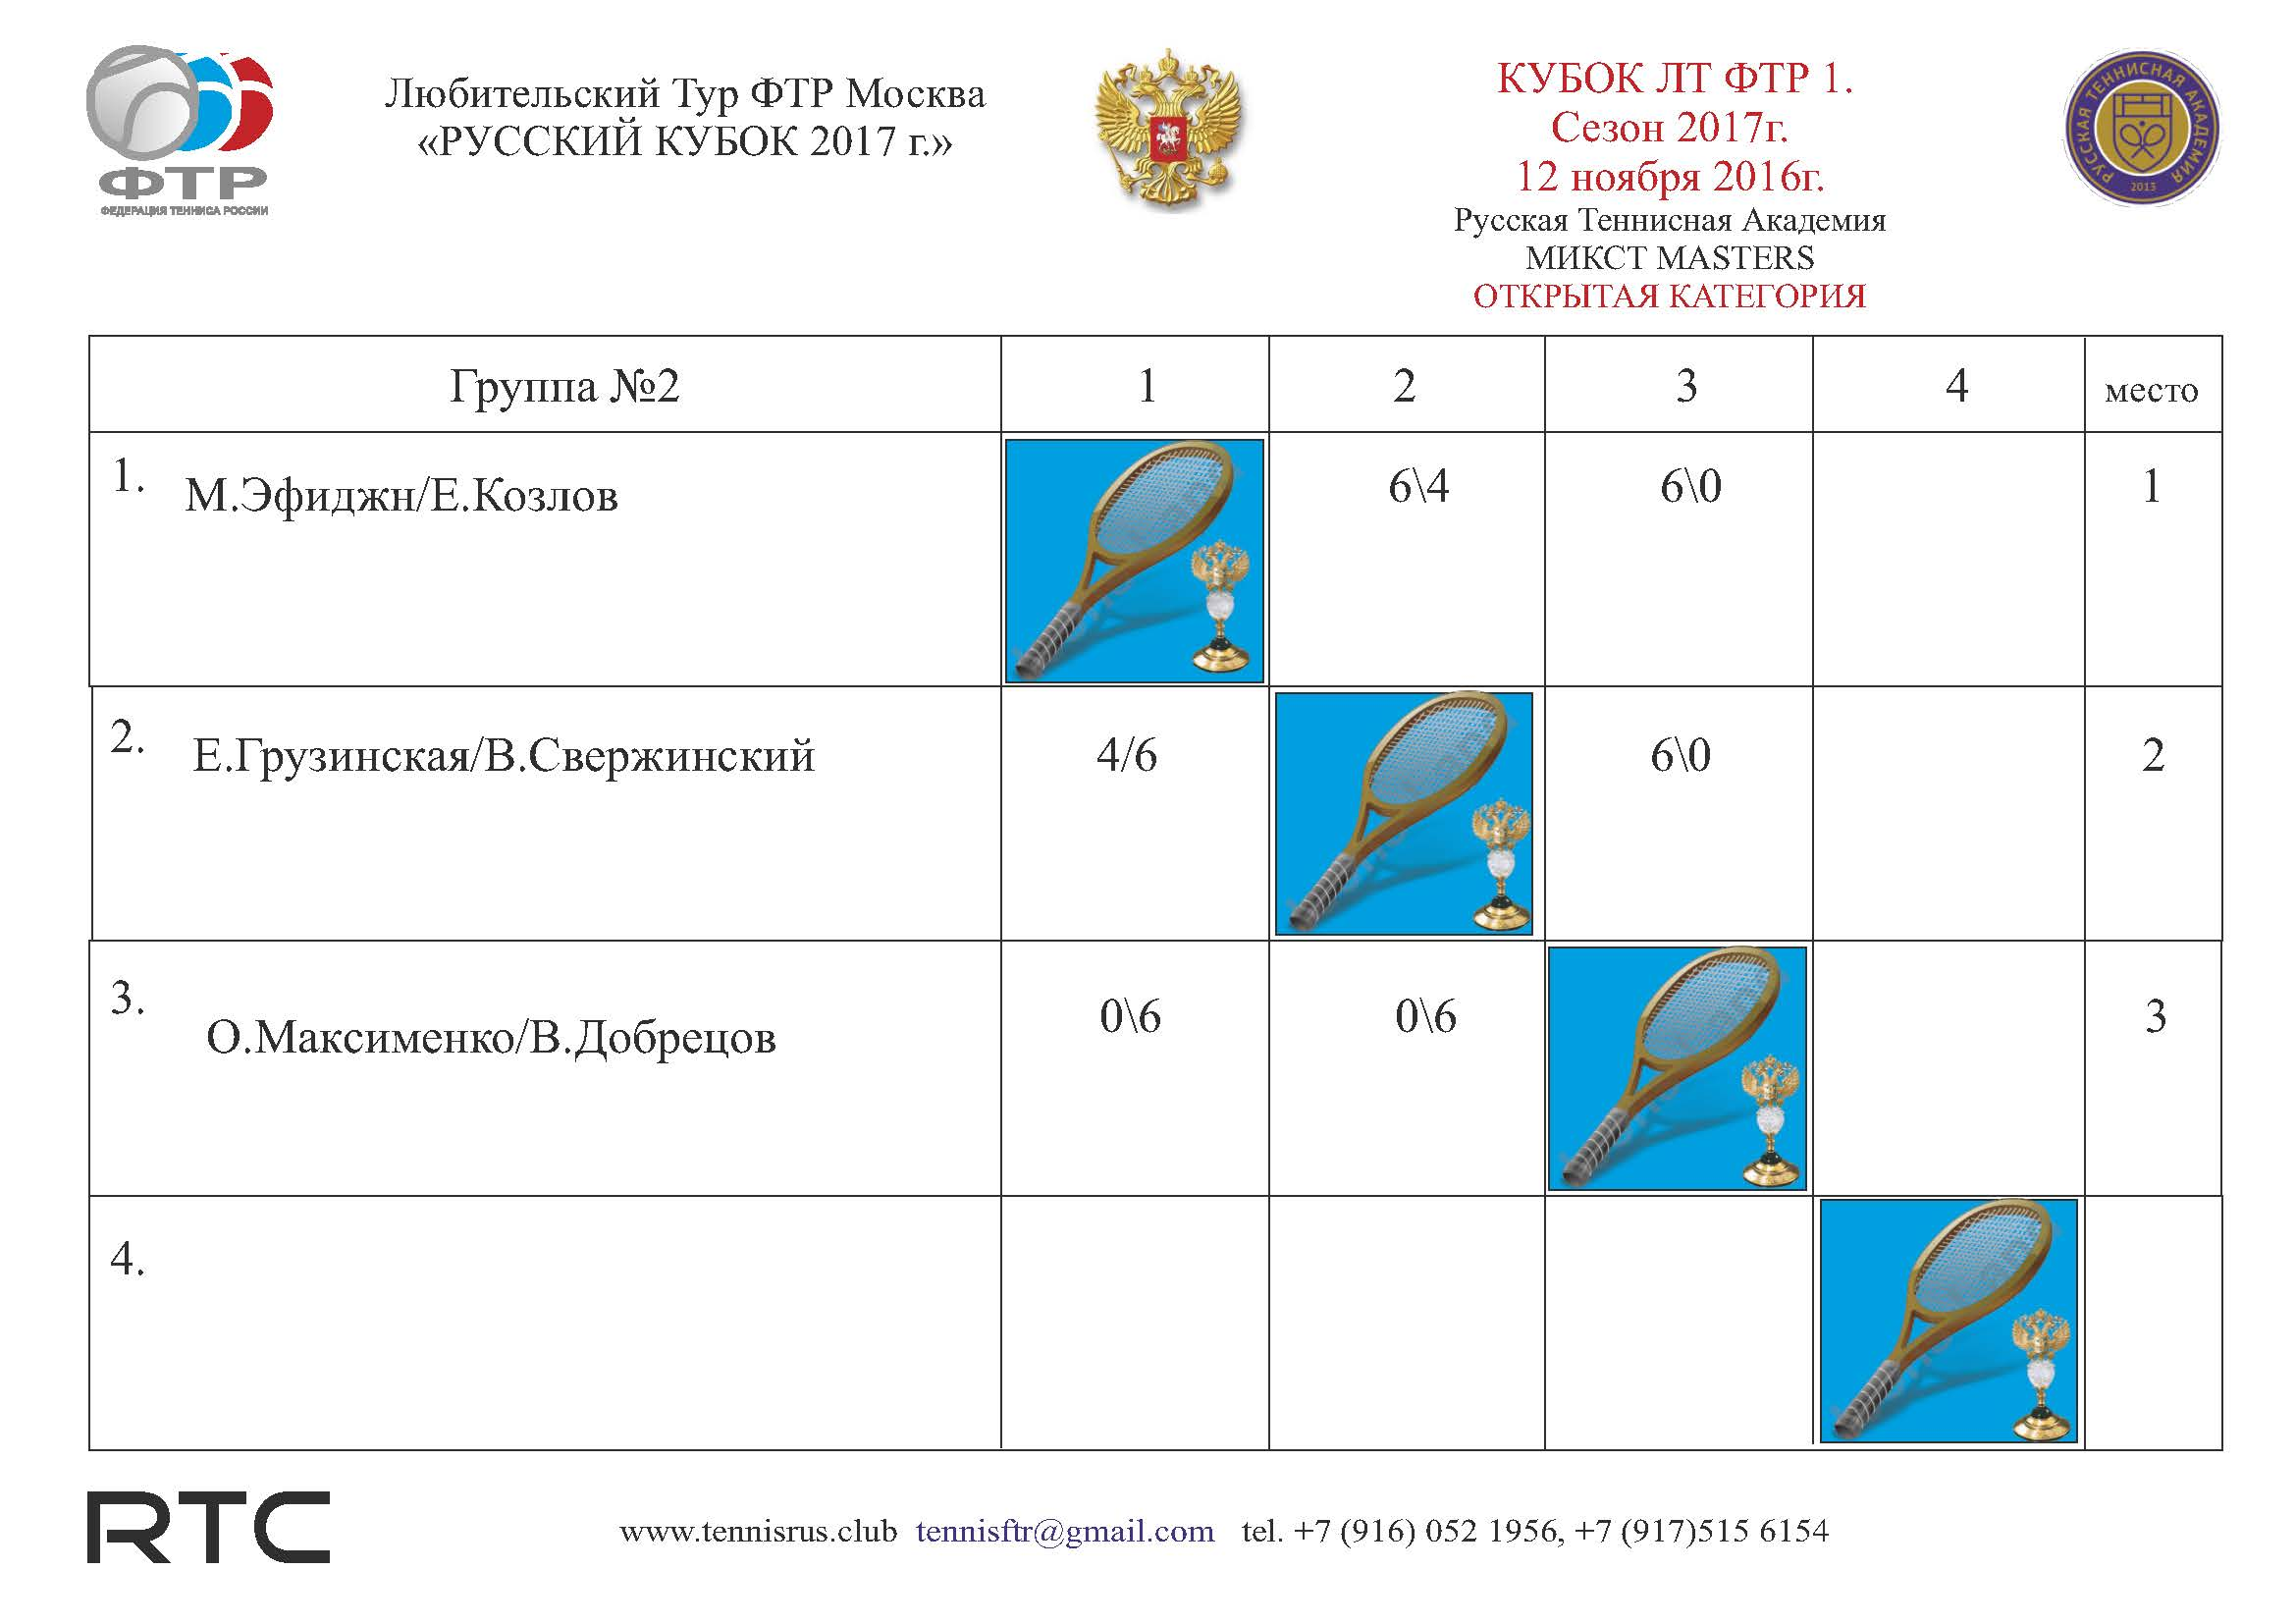 LT CUP 1 2017 6-11-16 GROUP 2.pdf